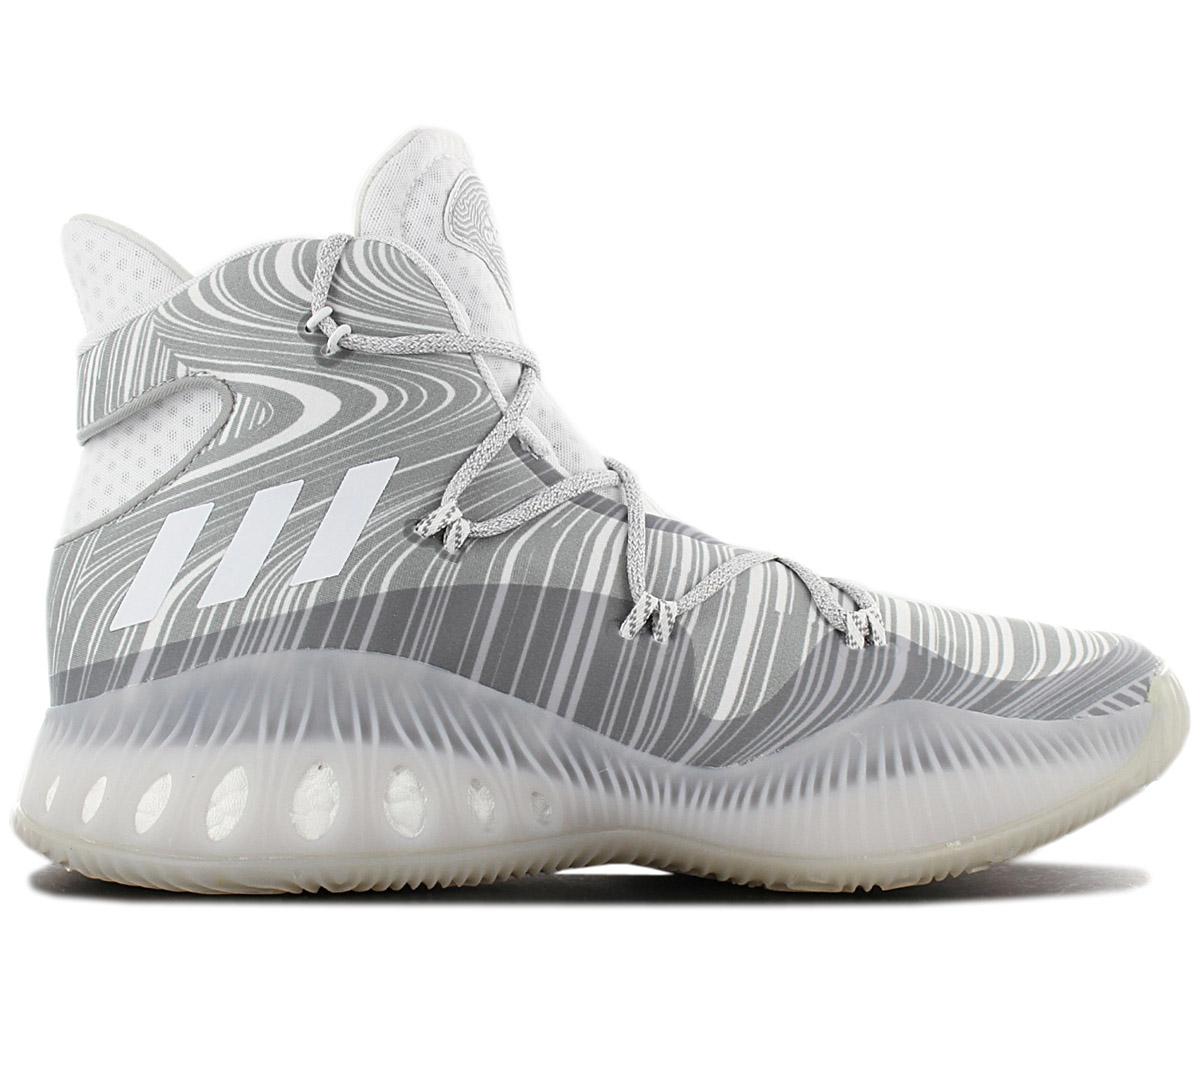 Details zu adidas Crazy Explosive Boost Herren Basketballschuhe B42424 Grau Sportschuhe NEU